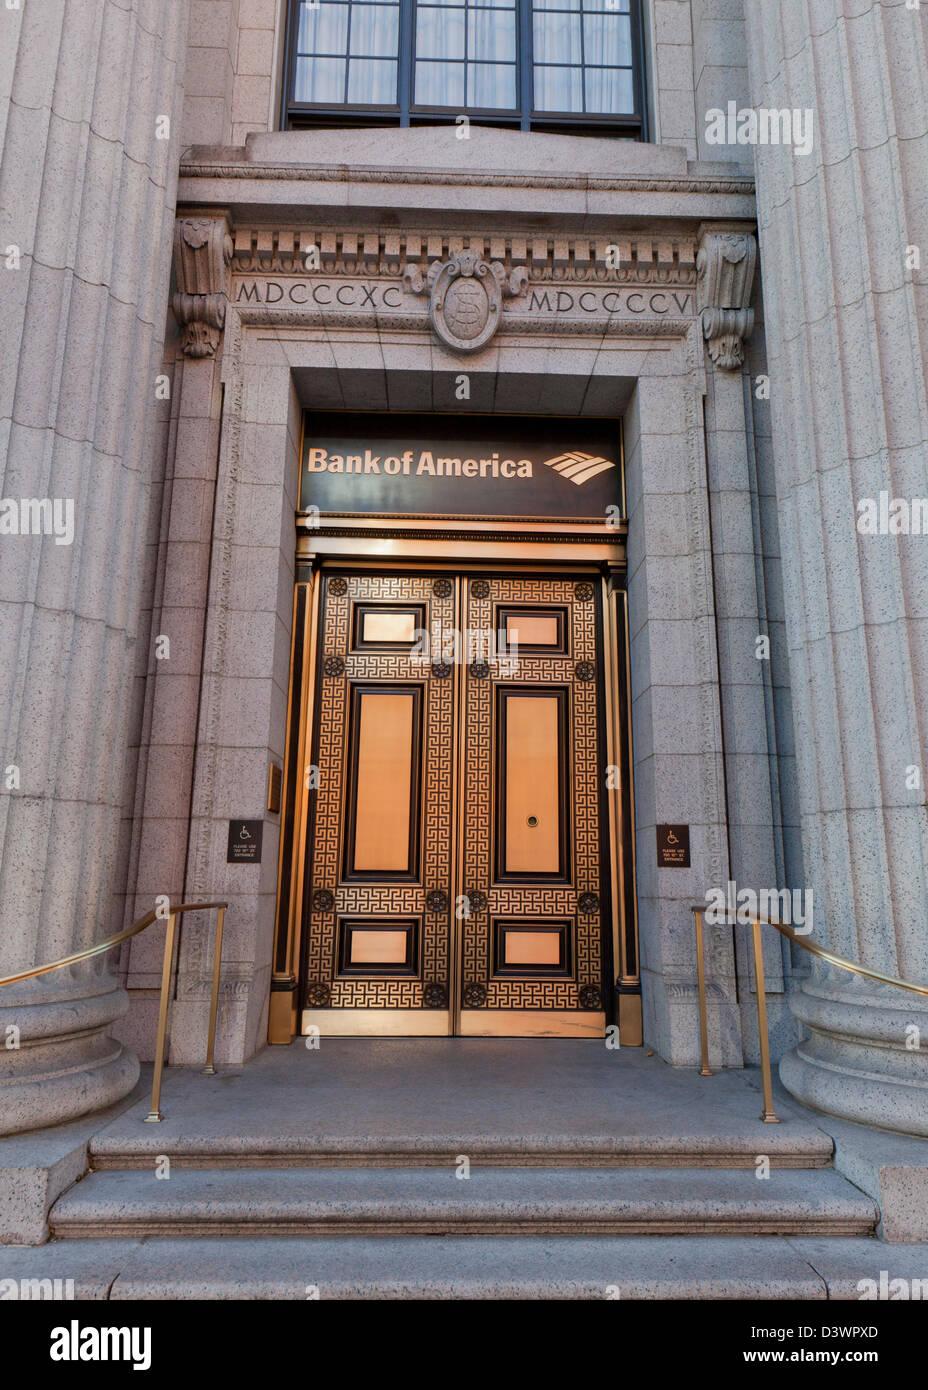 Bank of America building - Washington, DC - Stock Image